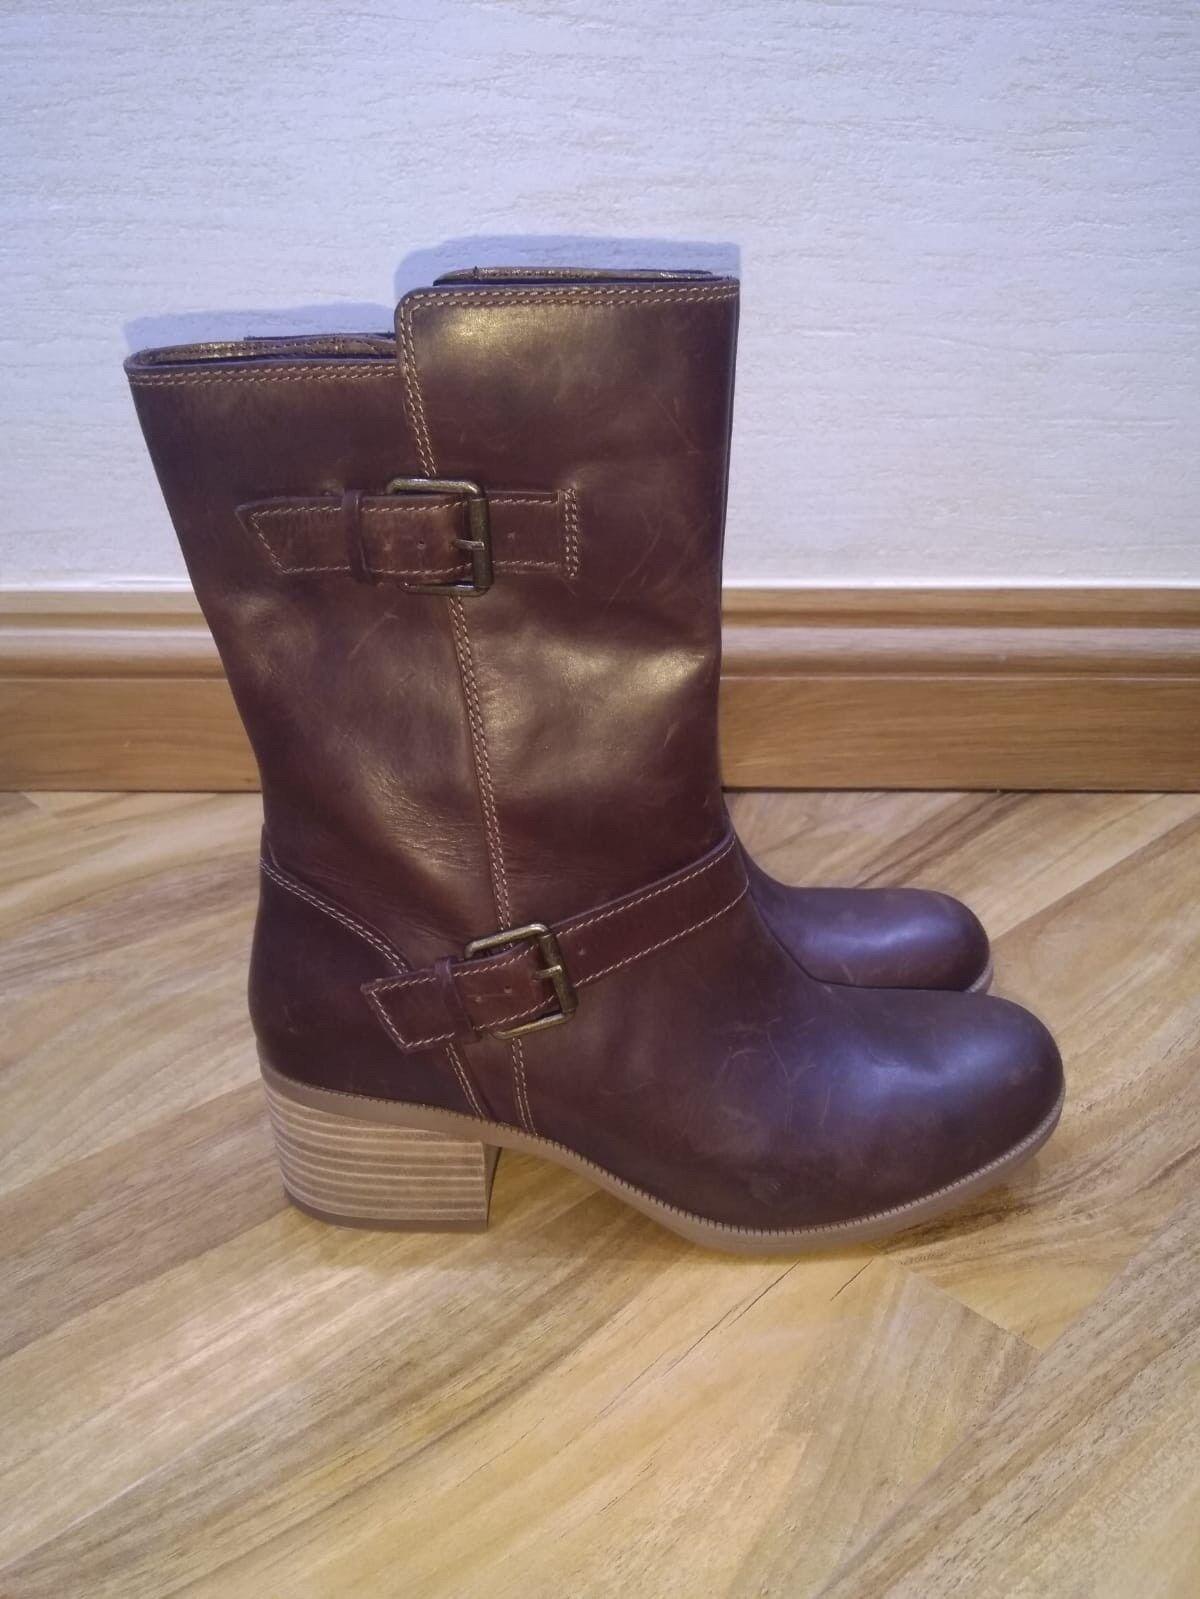 BNWOB CLARKS marrón CALF LEATHER botas Talla 6.5